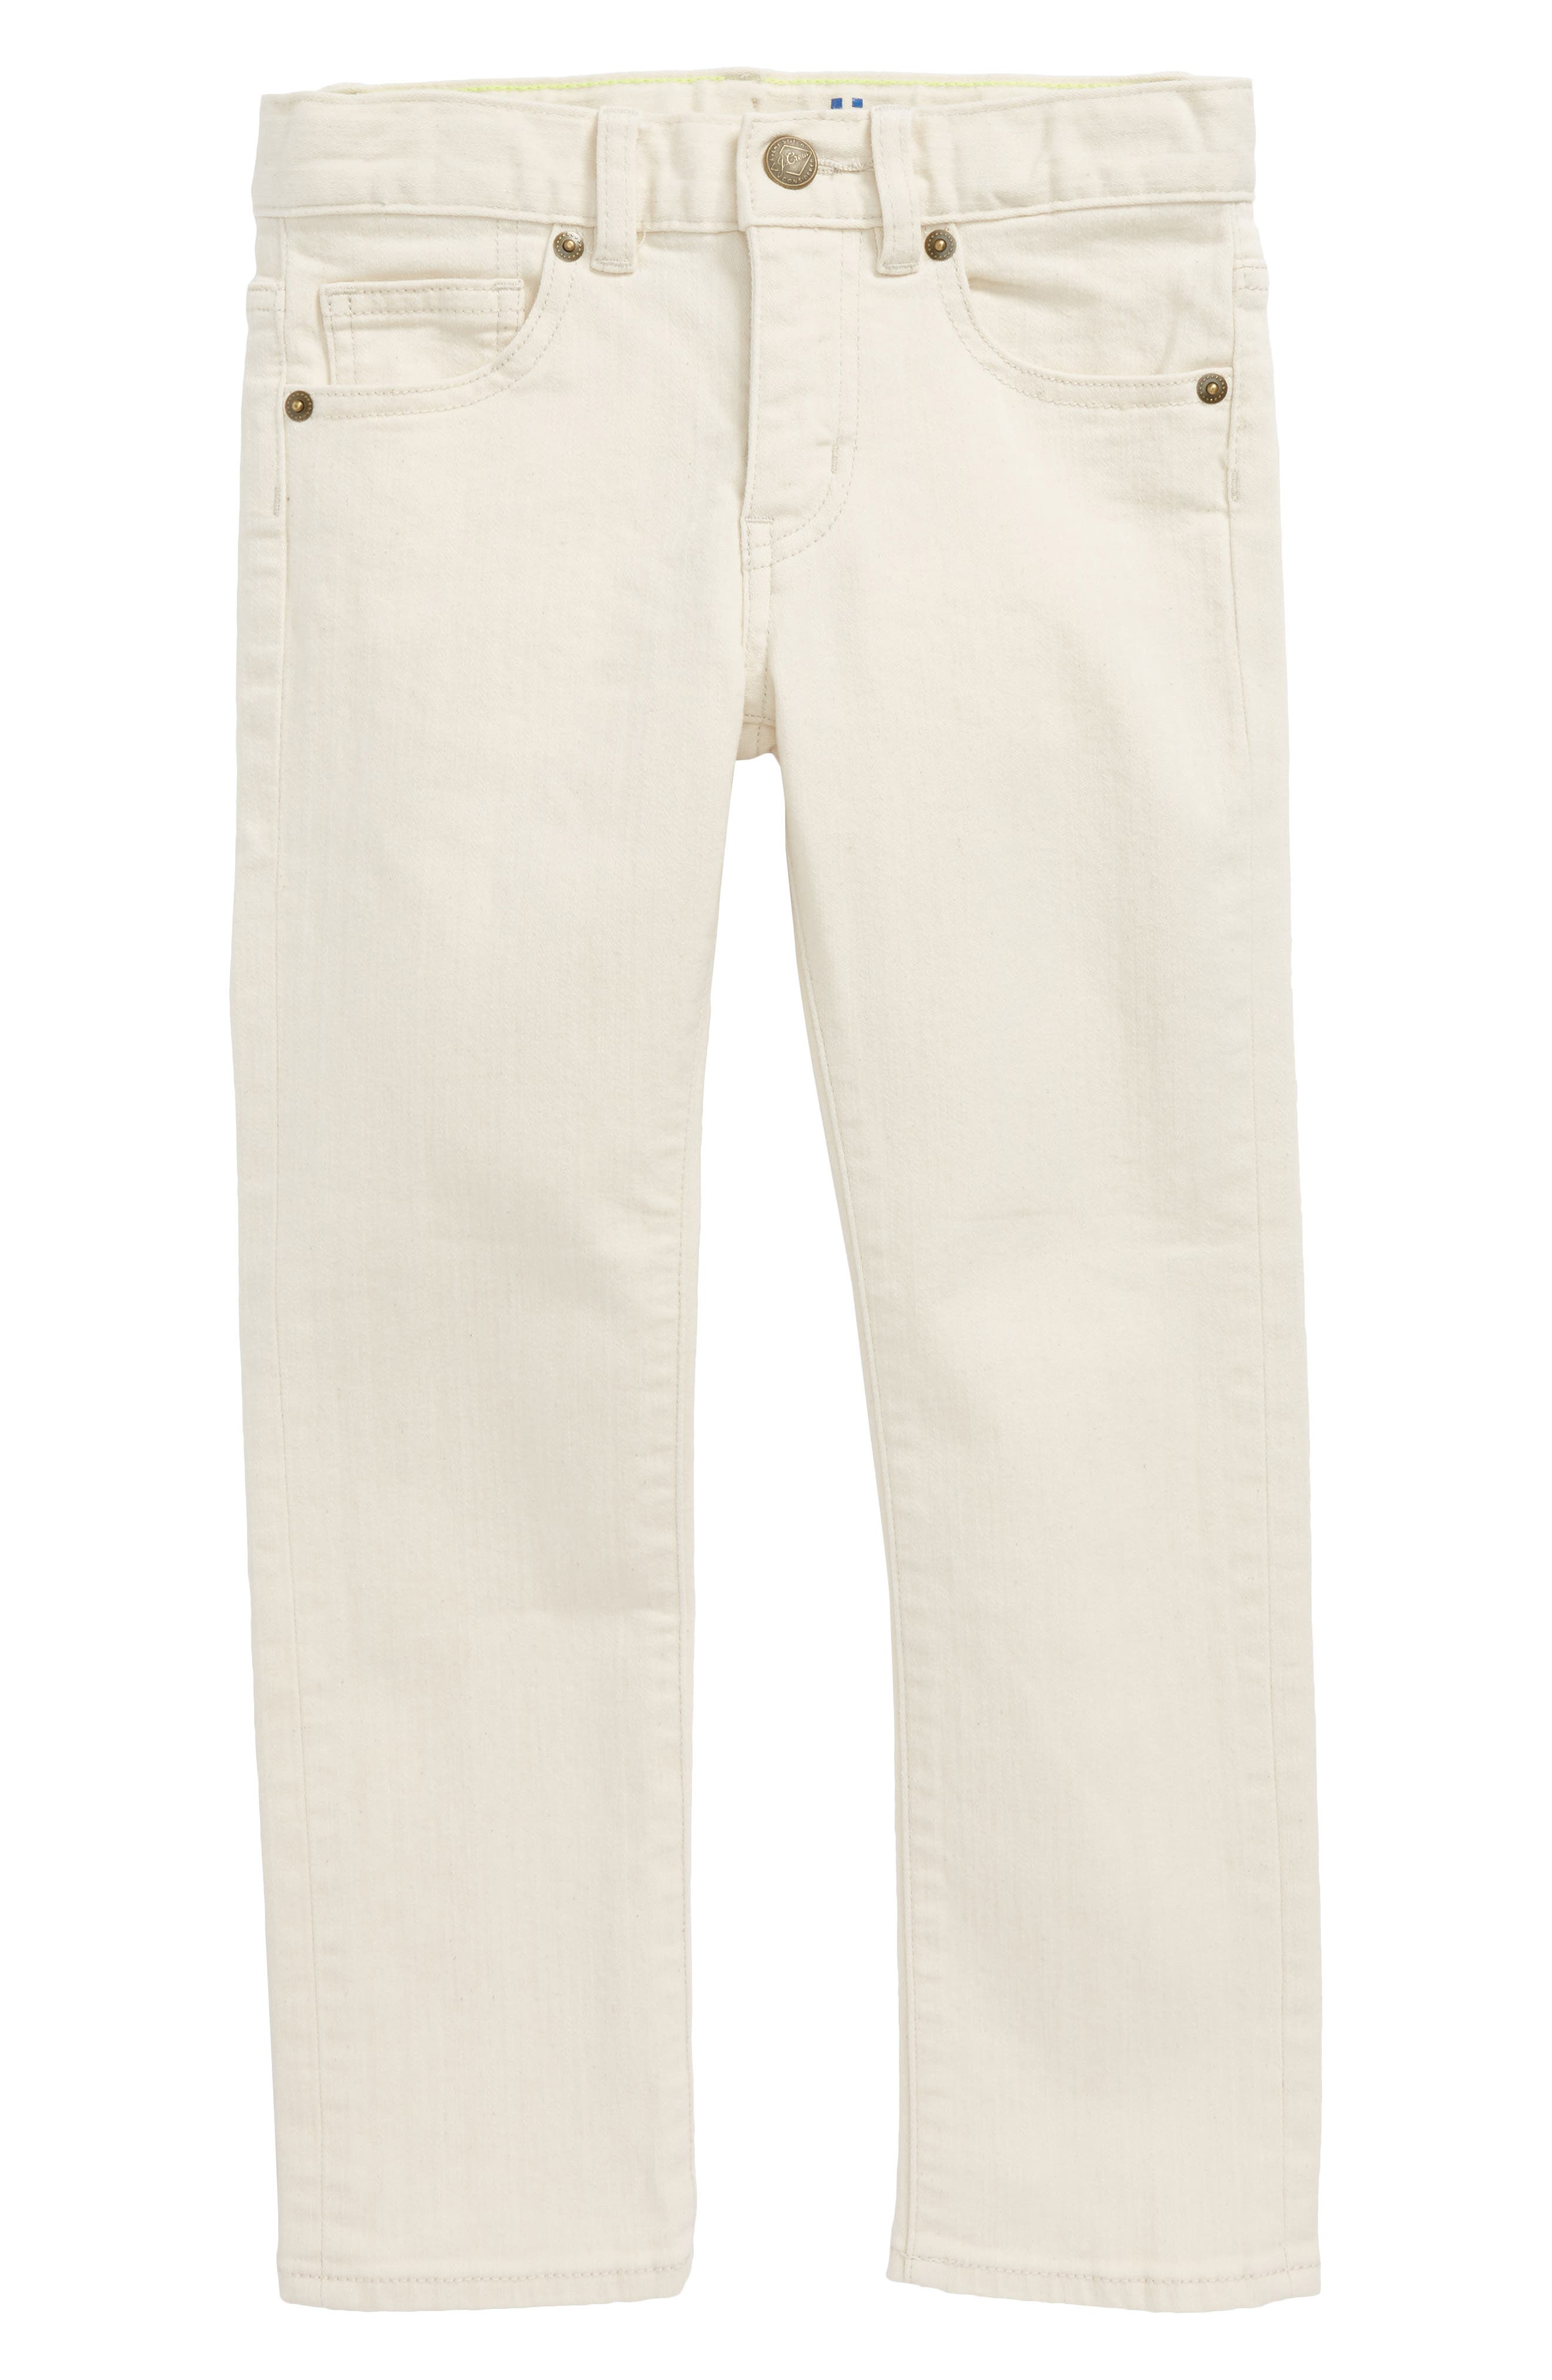 Ecru Slim Fit Pants,                             Main thumbnail 1, color,                             900